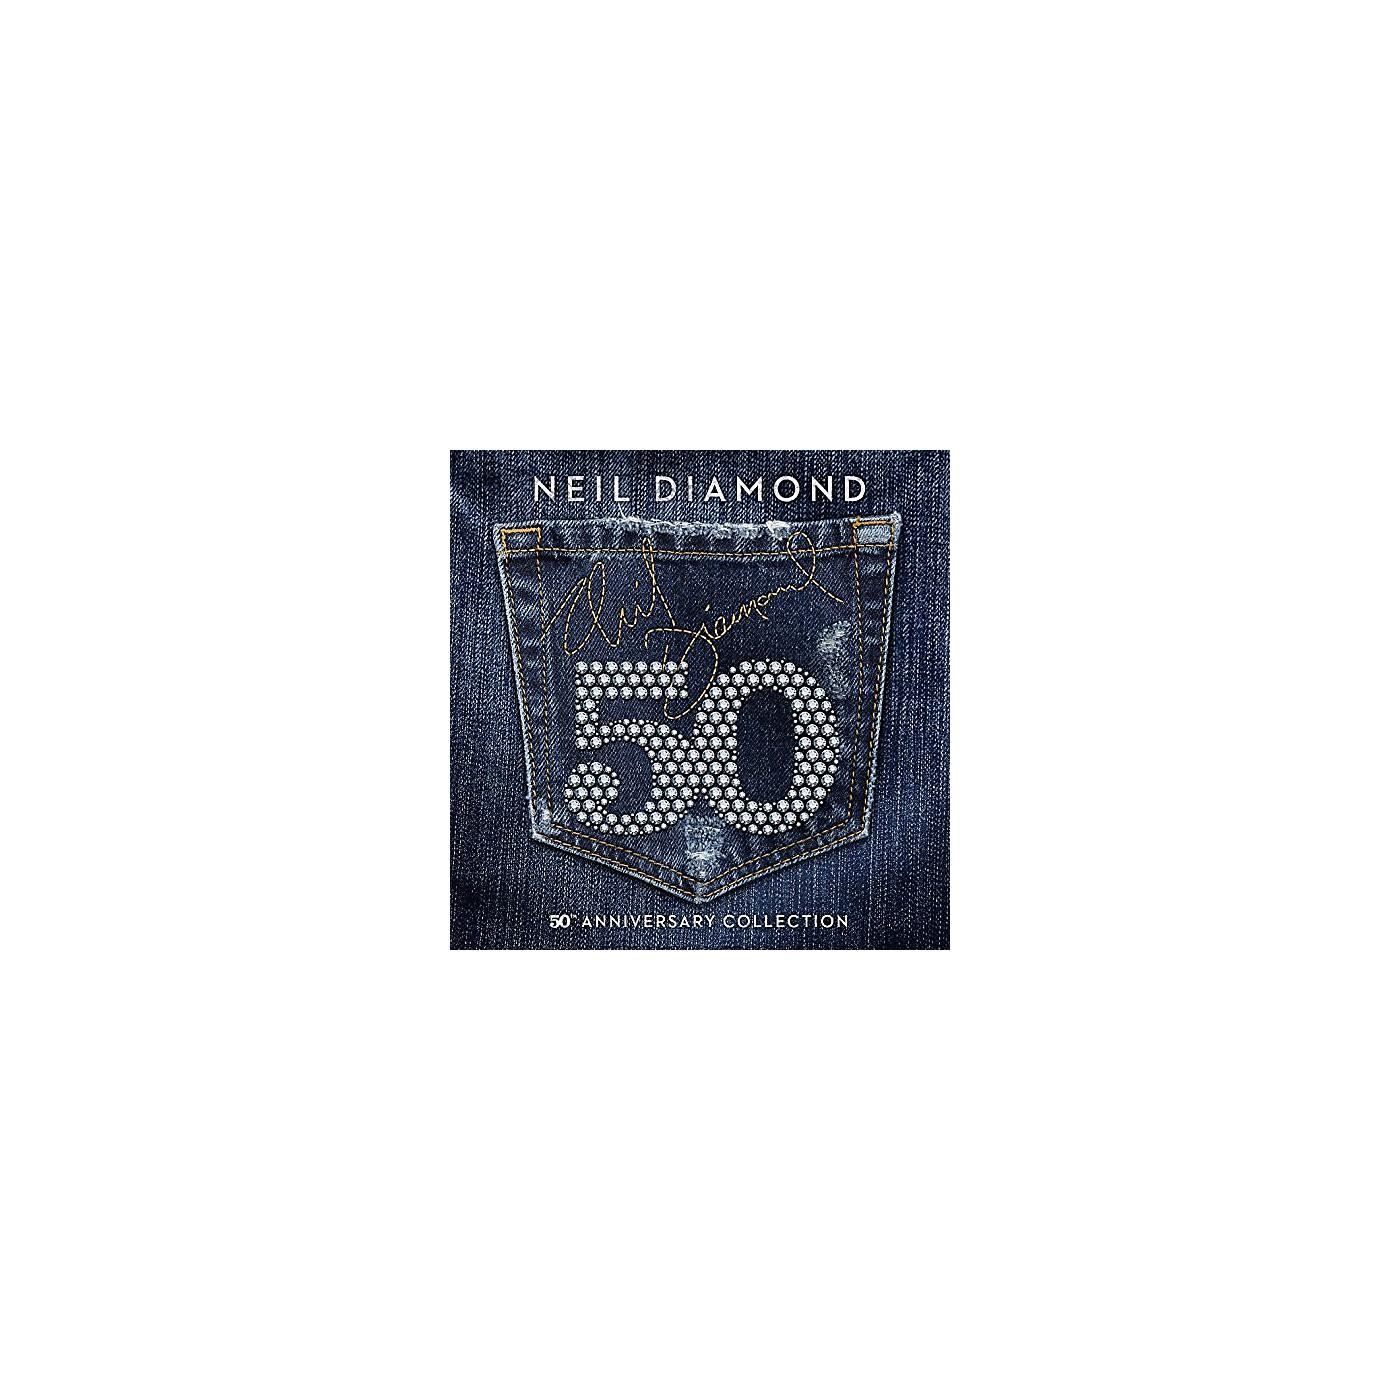 Alliance Neil Diamond - 50th Anniversary Collection (CD) thumbnail